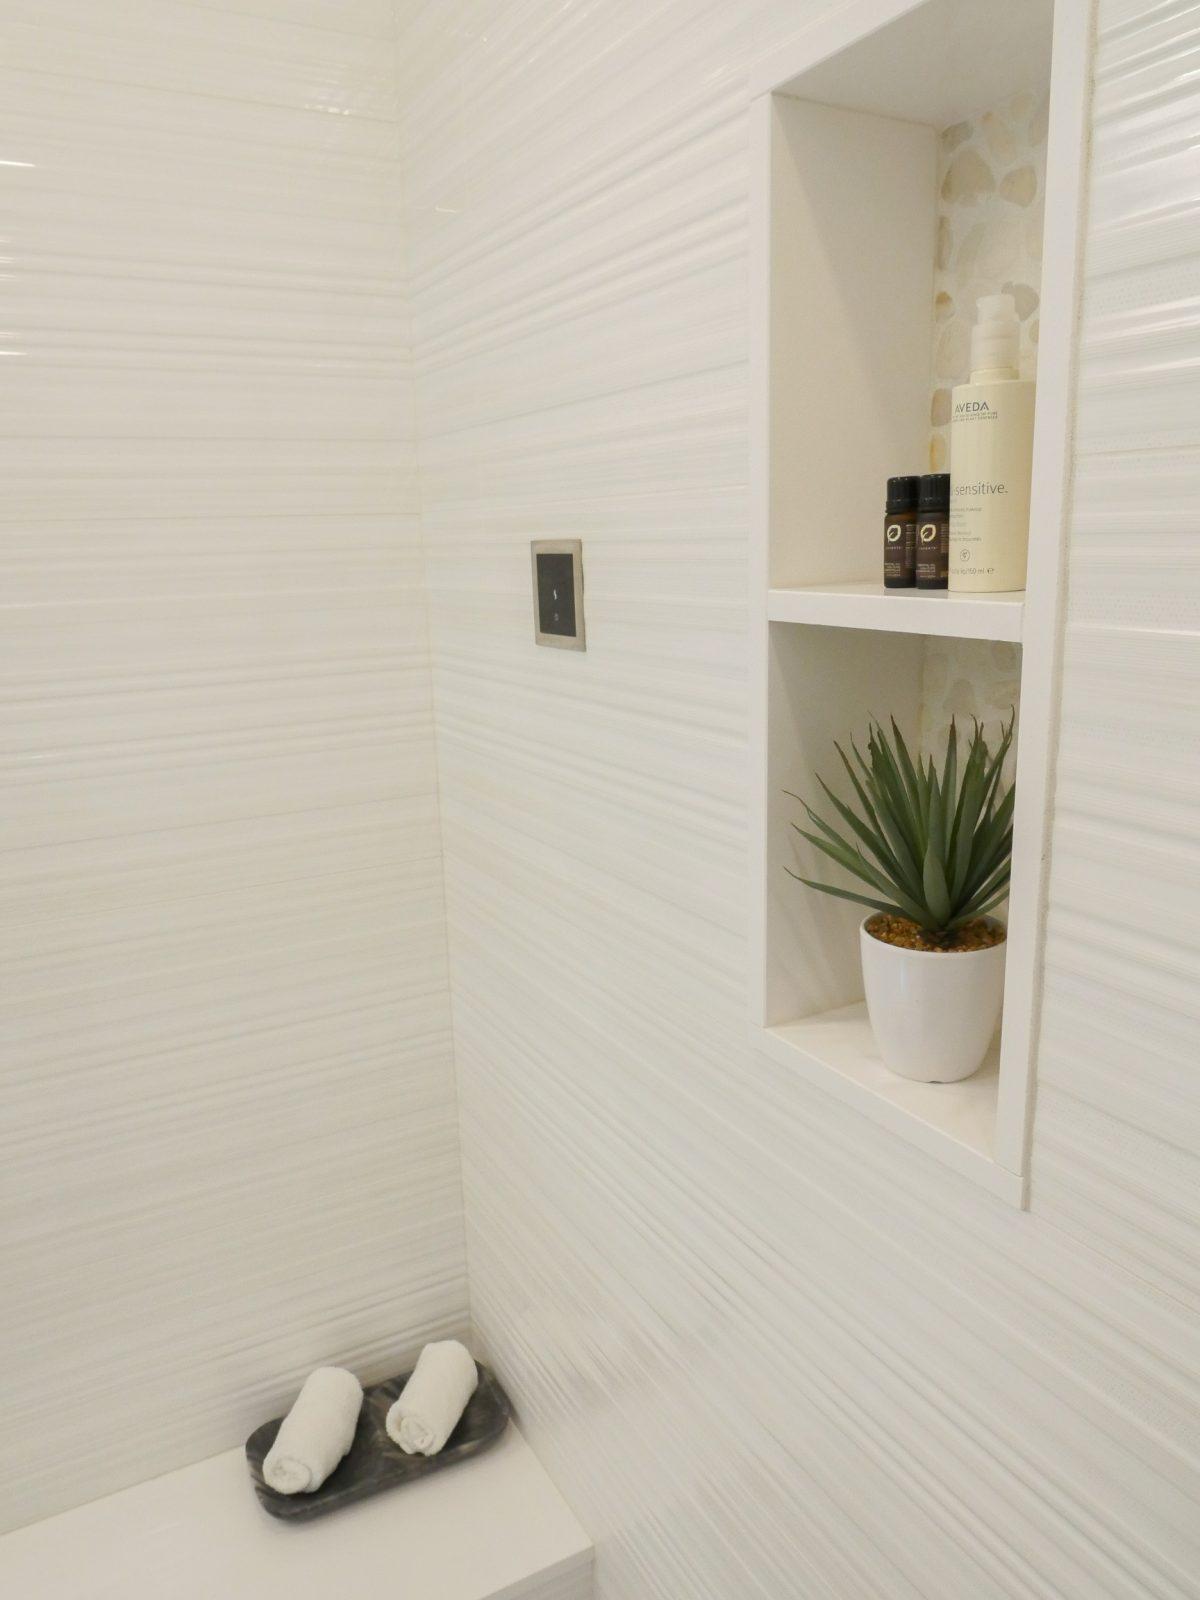 2017.03.31-Bathrooms-021